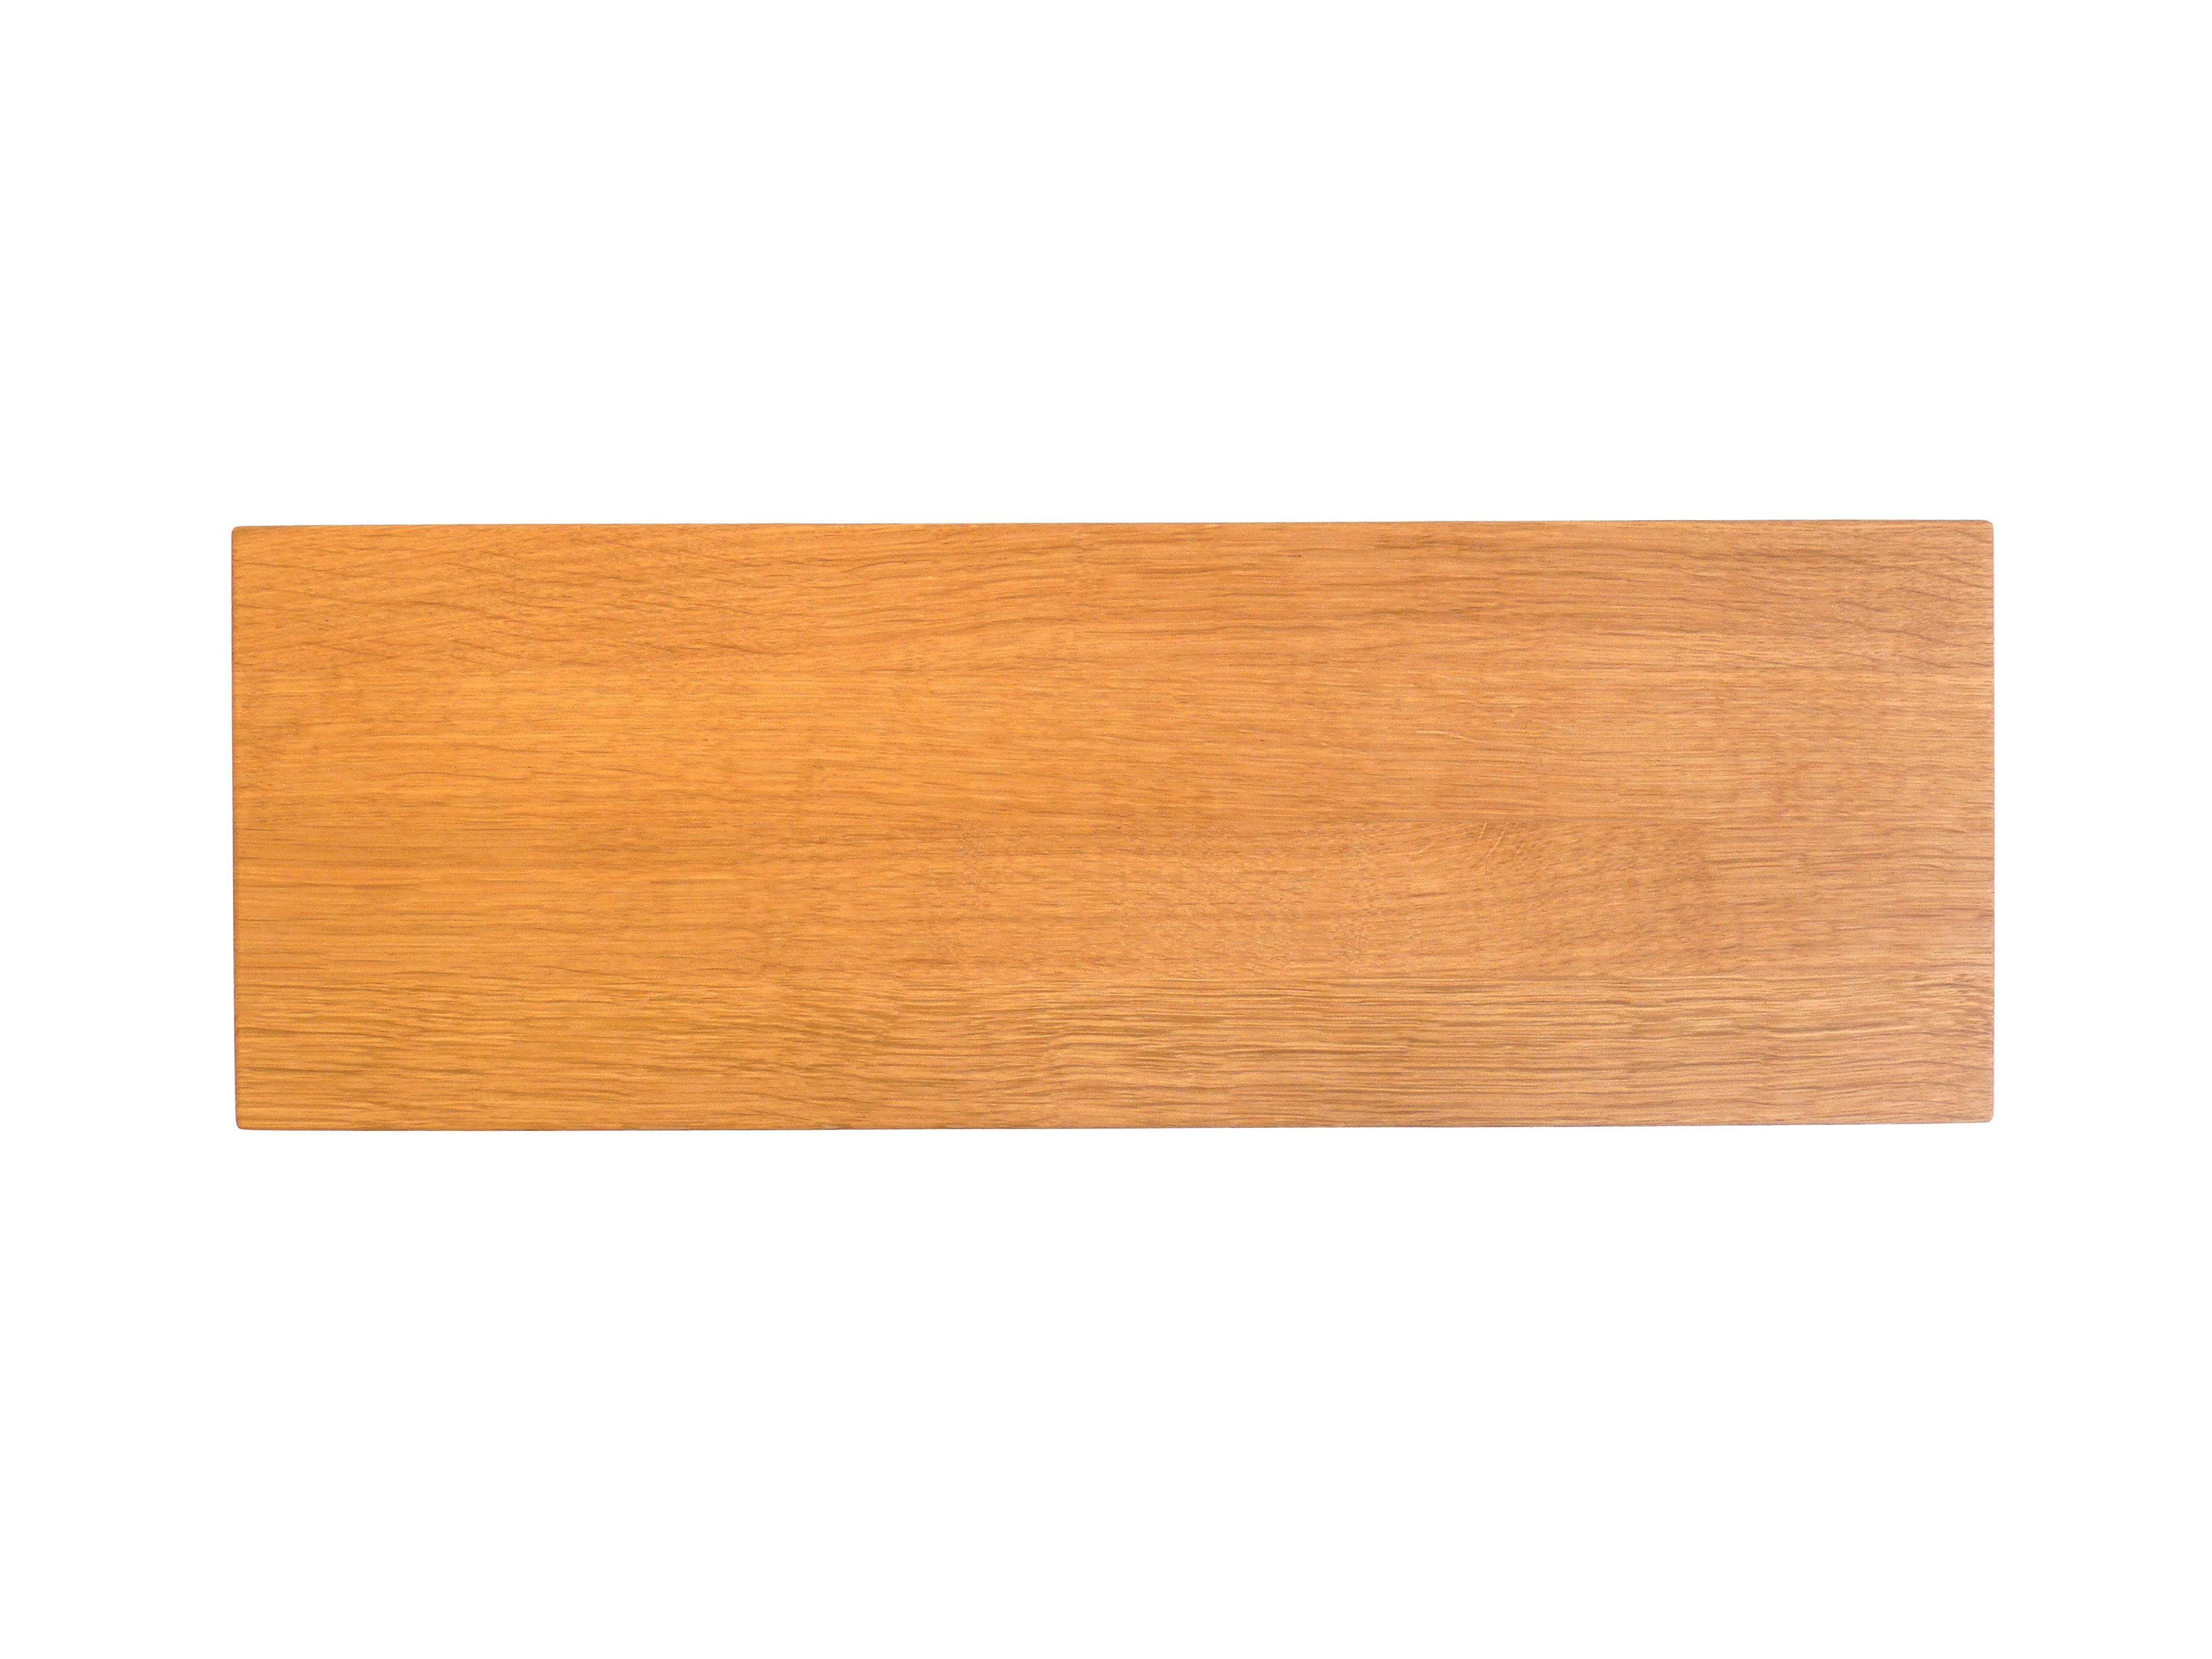 Planke Eiche